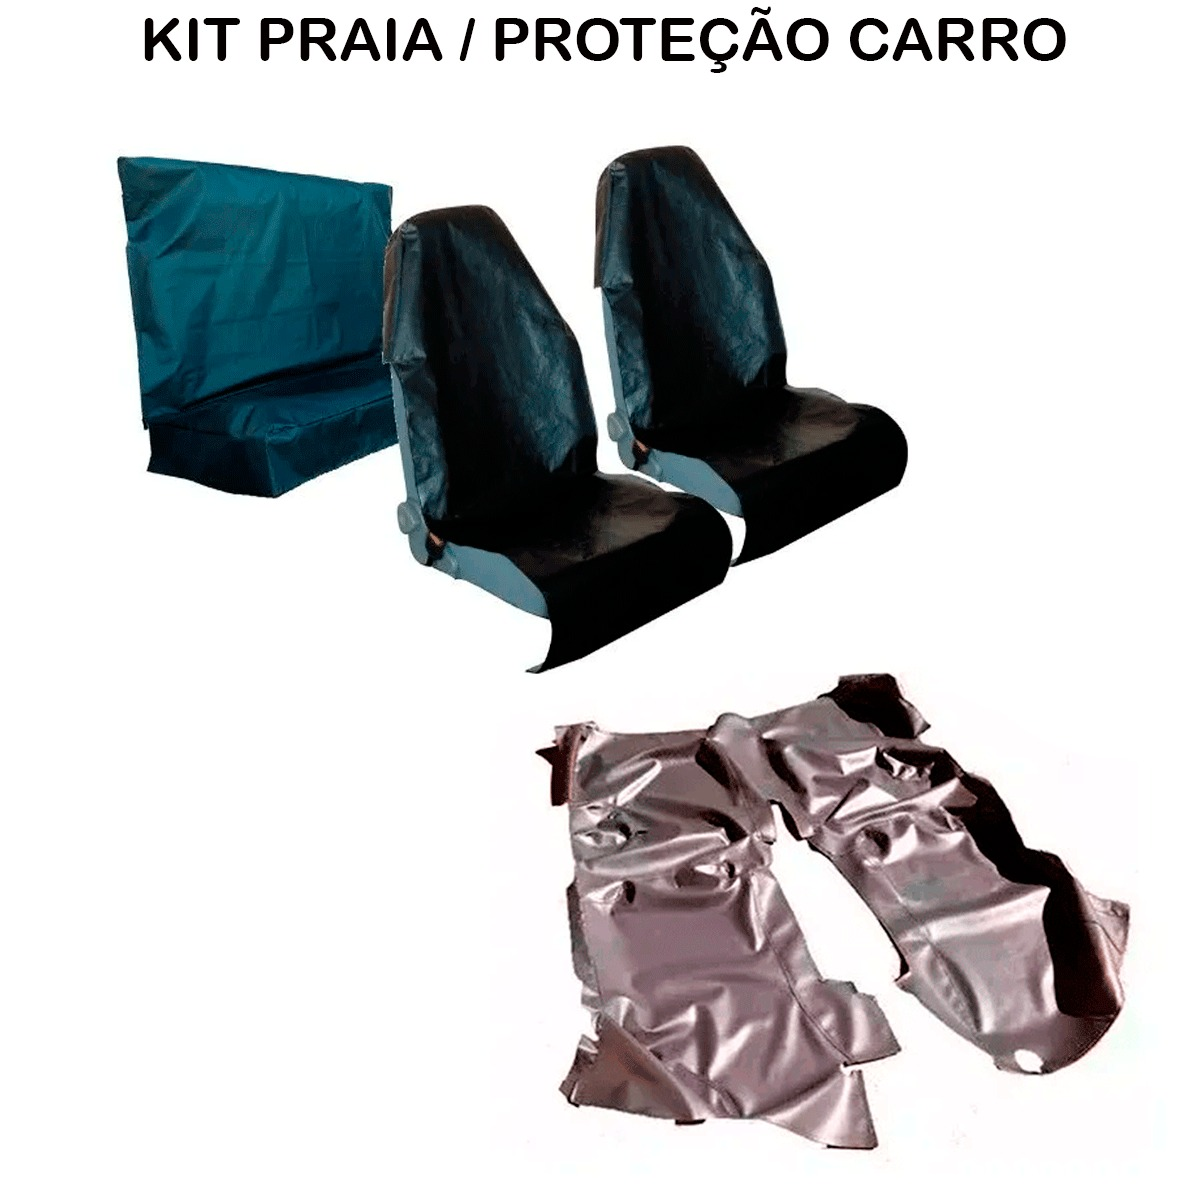 Tapete Em Vinil Chevrolet Agilie 2009 a 2019 + Capa Banco Protecao Banco Areia Suor Academia